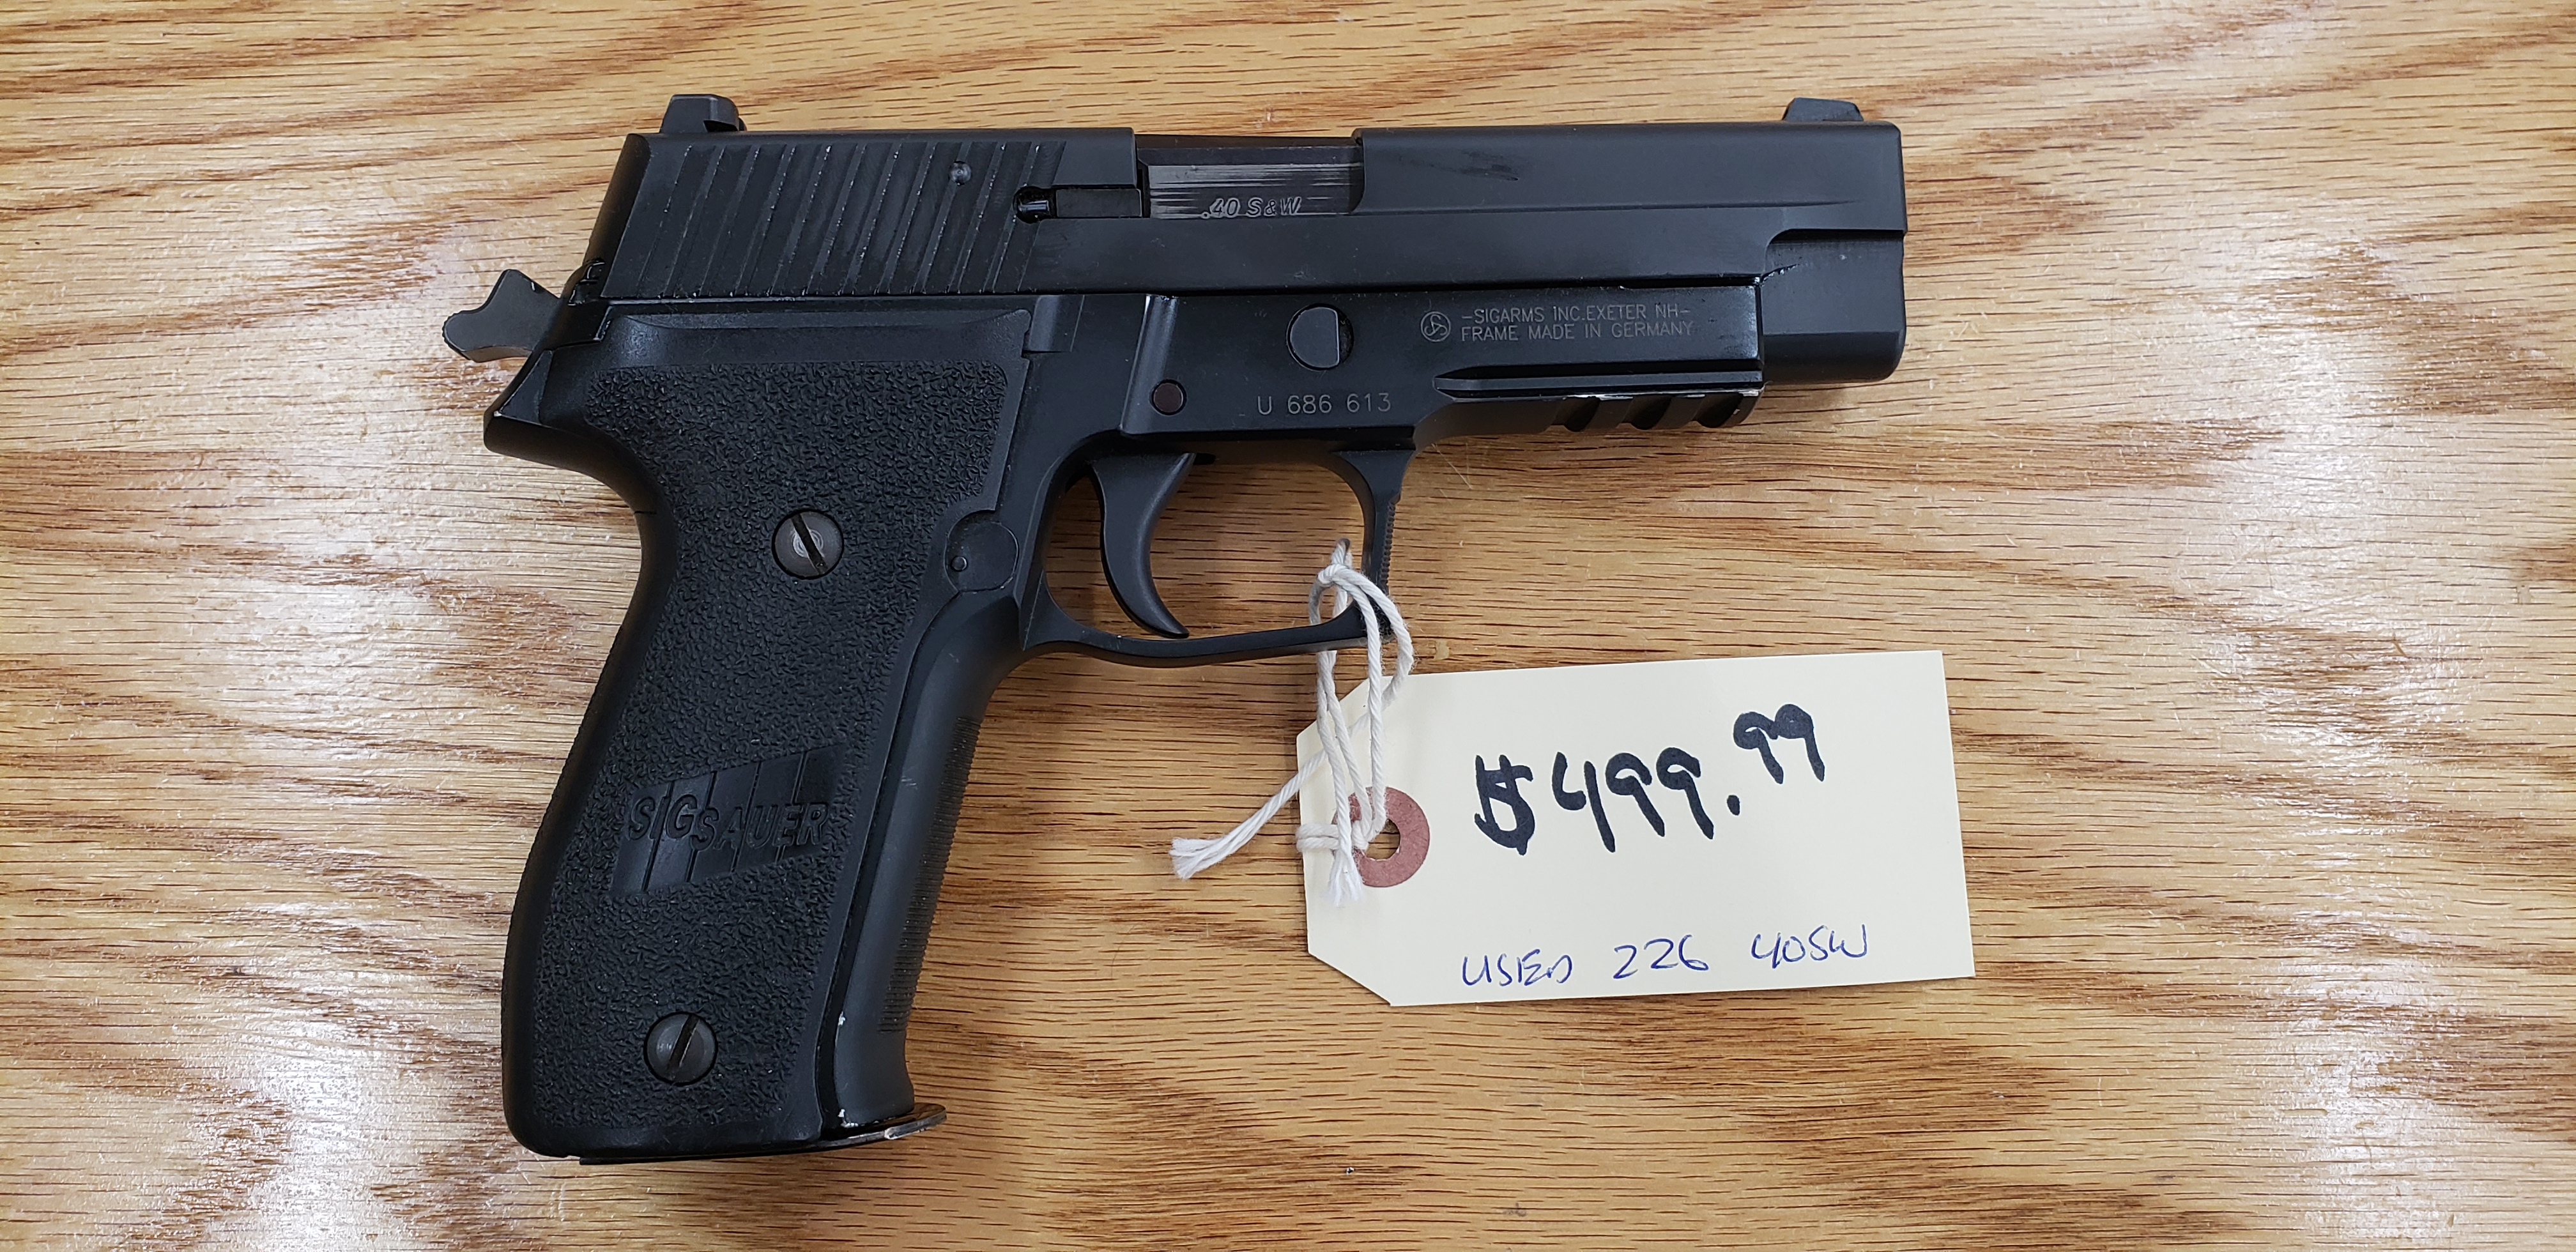 SIG P226 .40 S&W-2